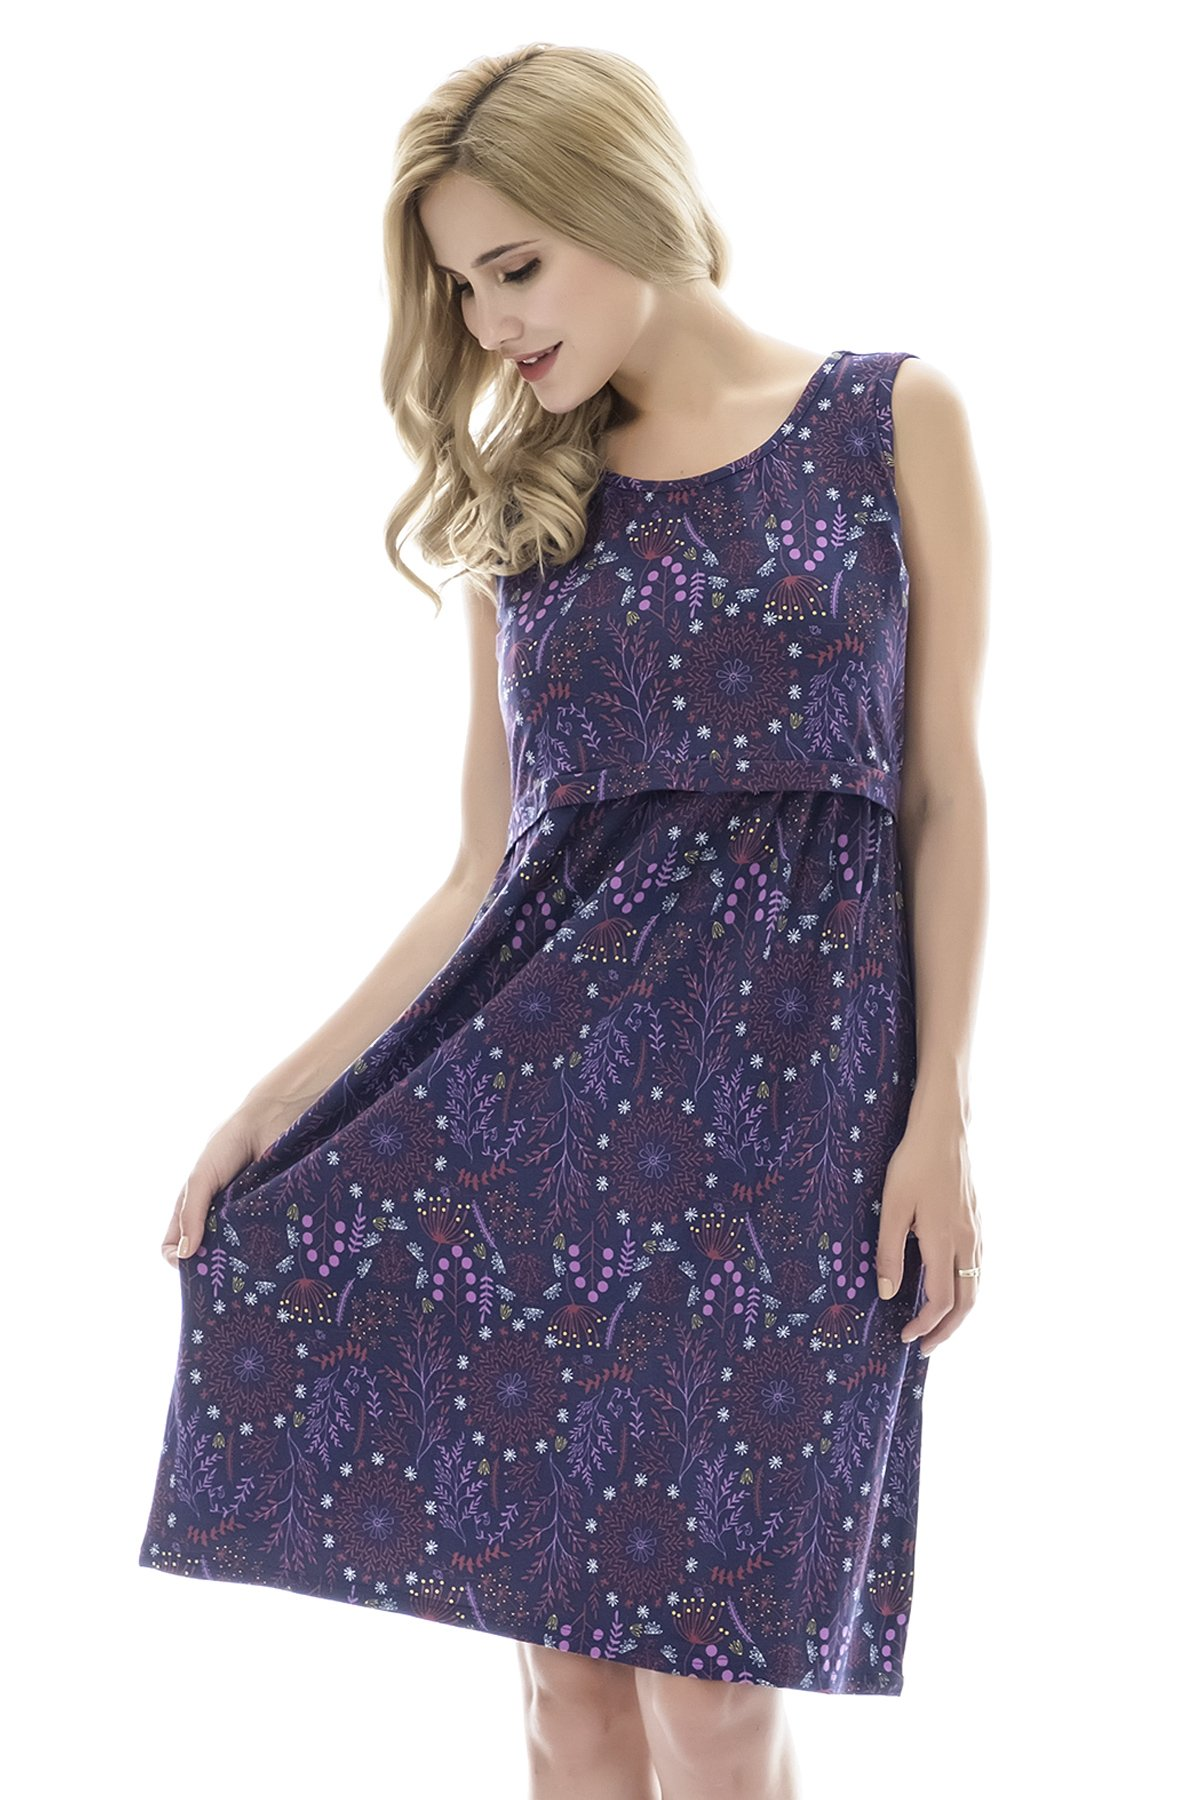 Bearsland Womens Sleeveless Maternity Dress Empire Waist Nursing Breastfeeding Dress Summer,purpletree, X-L